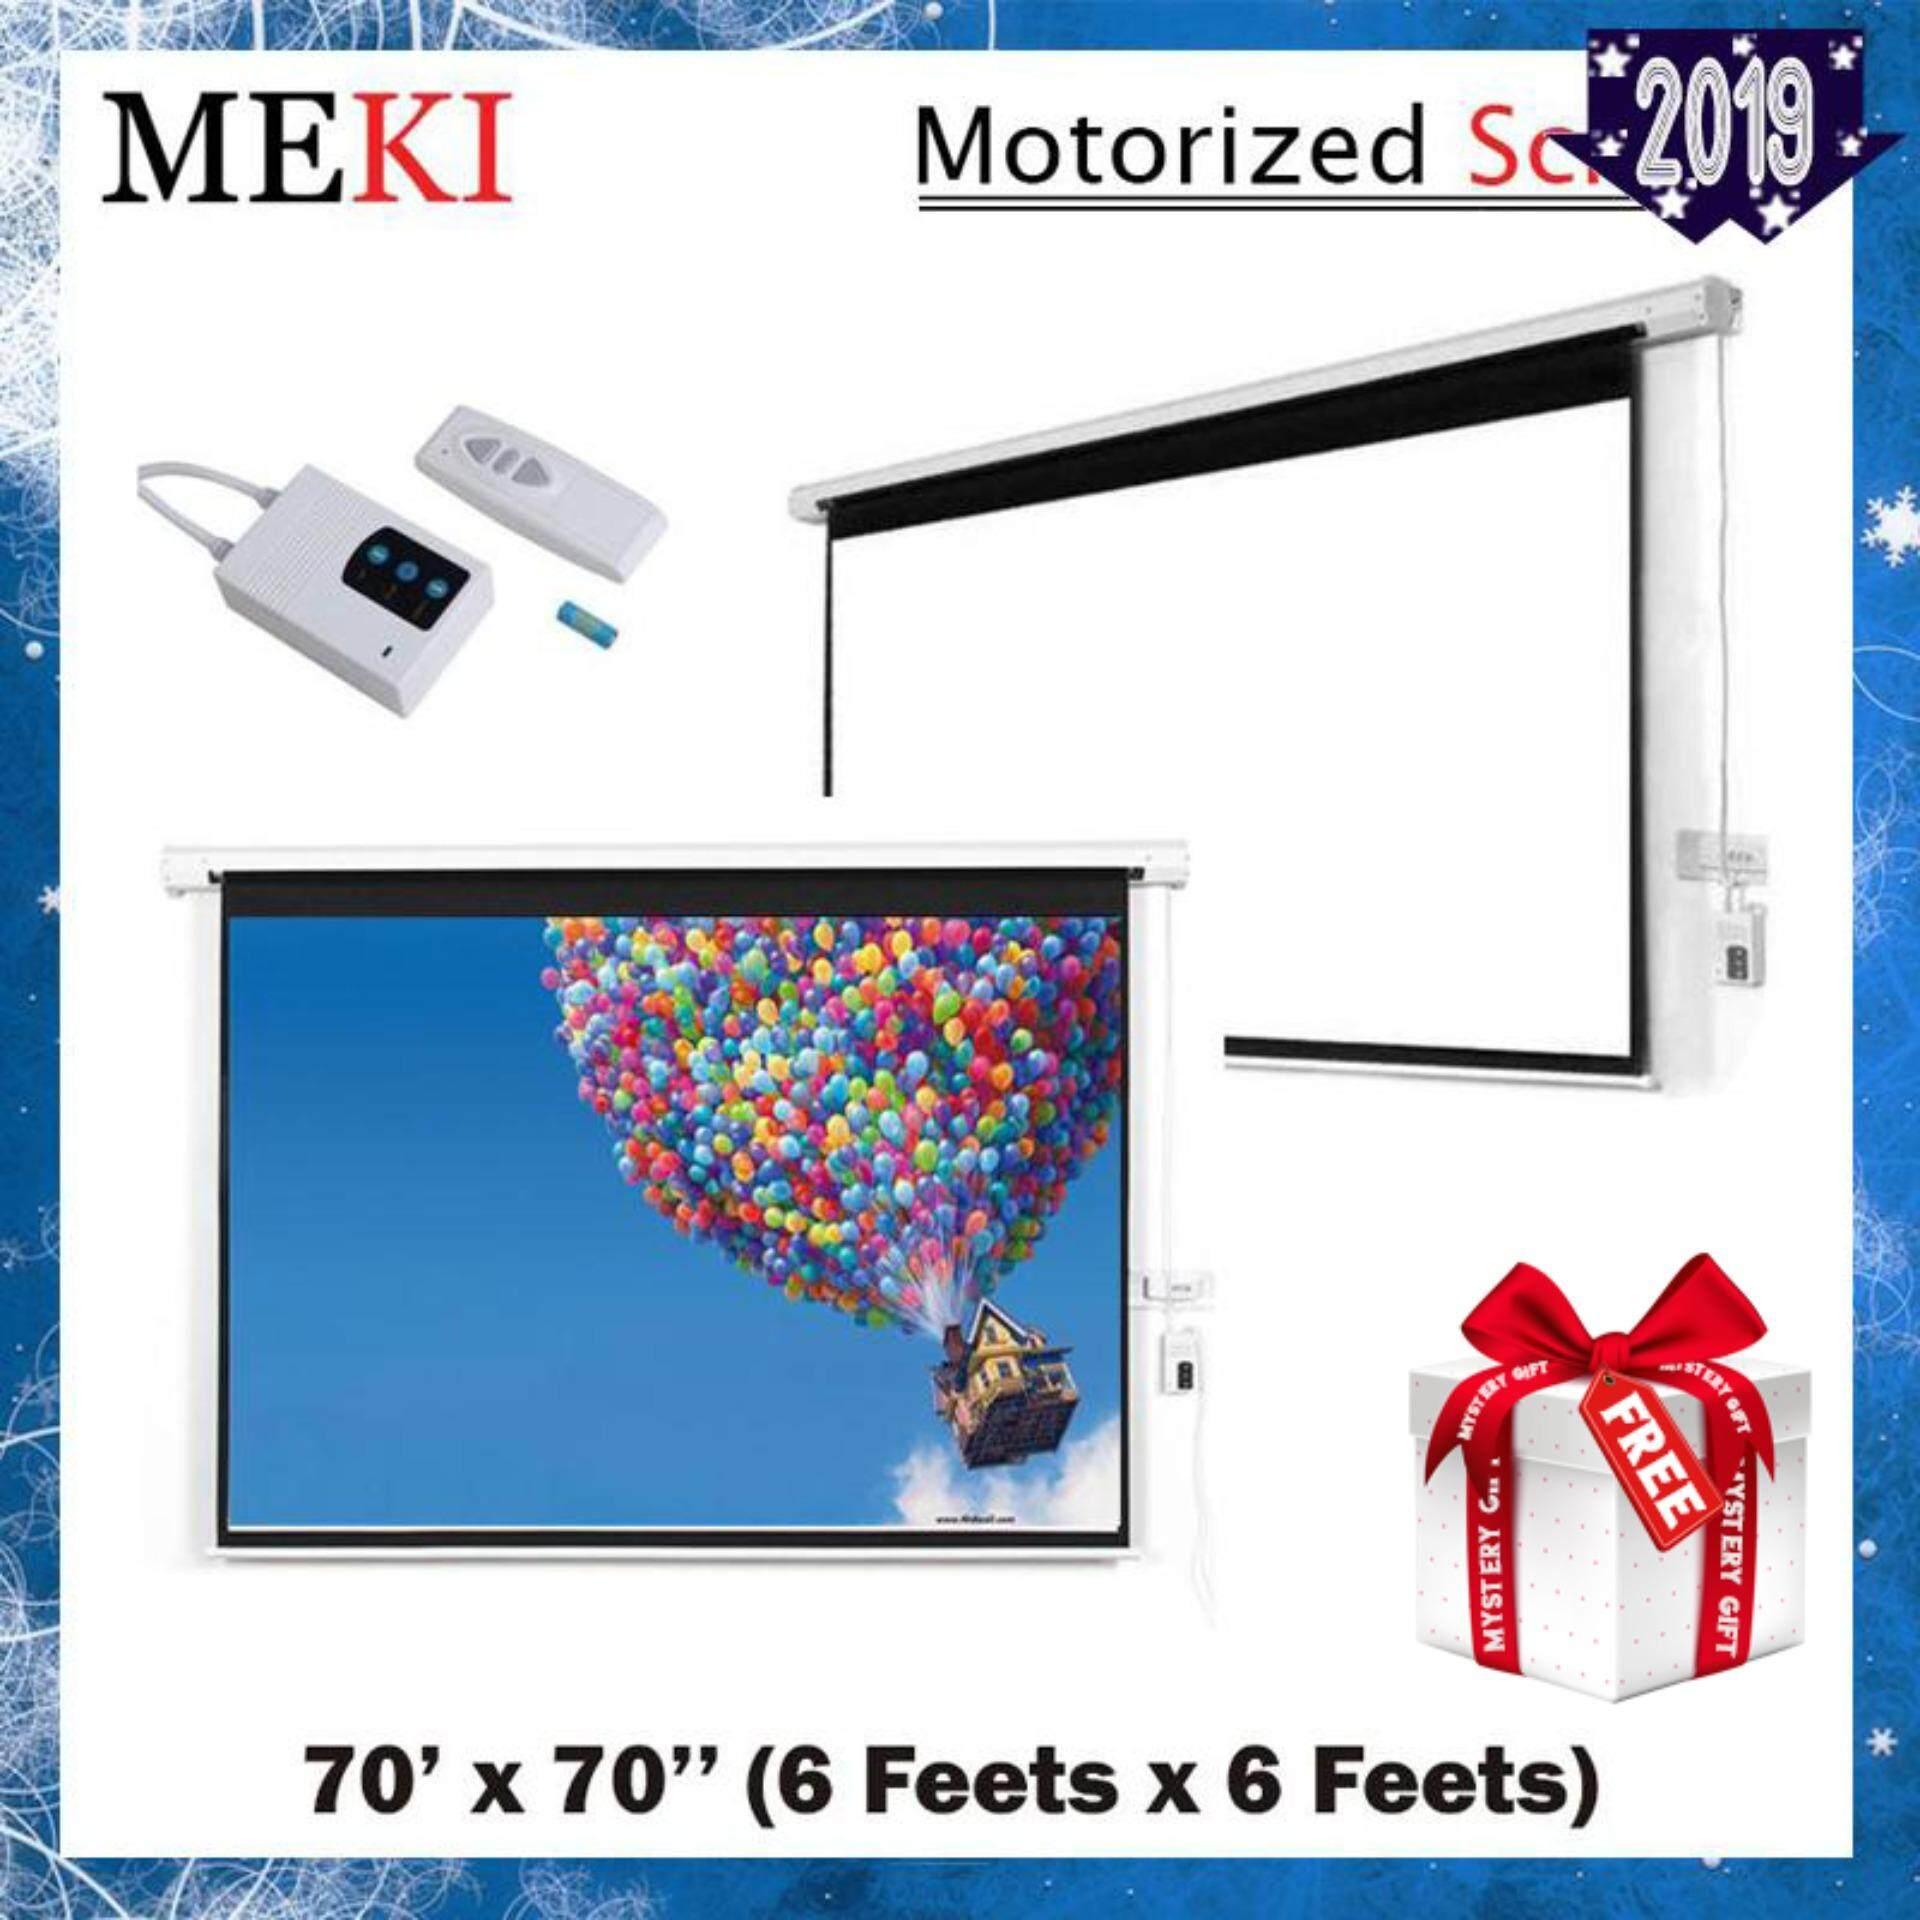 Meki EZ Screen Series High Quality Size 70